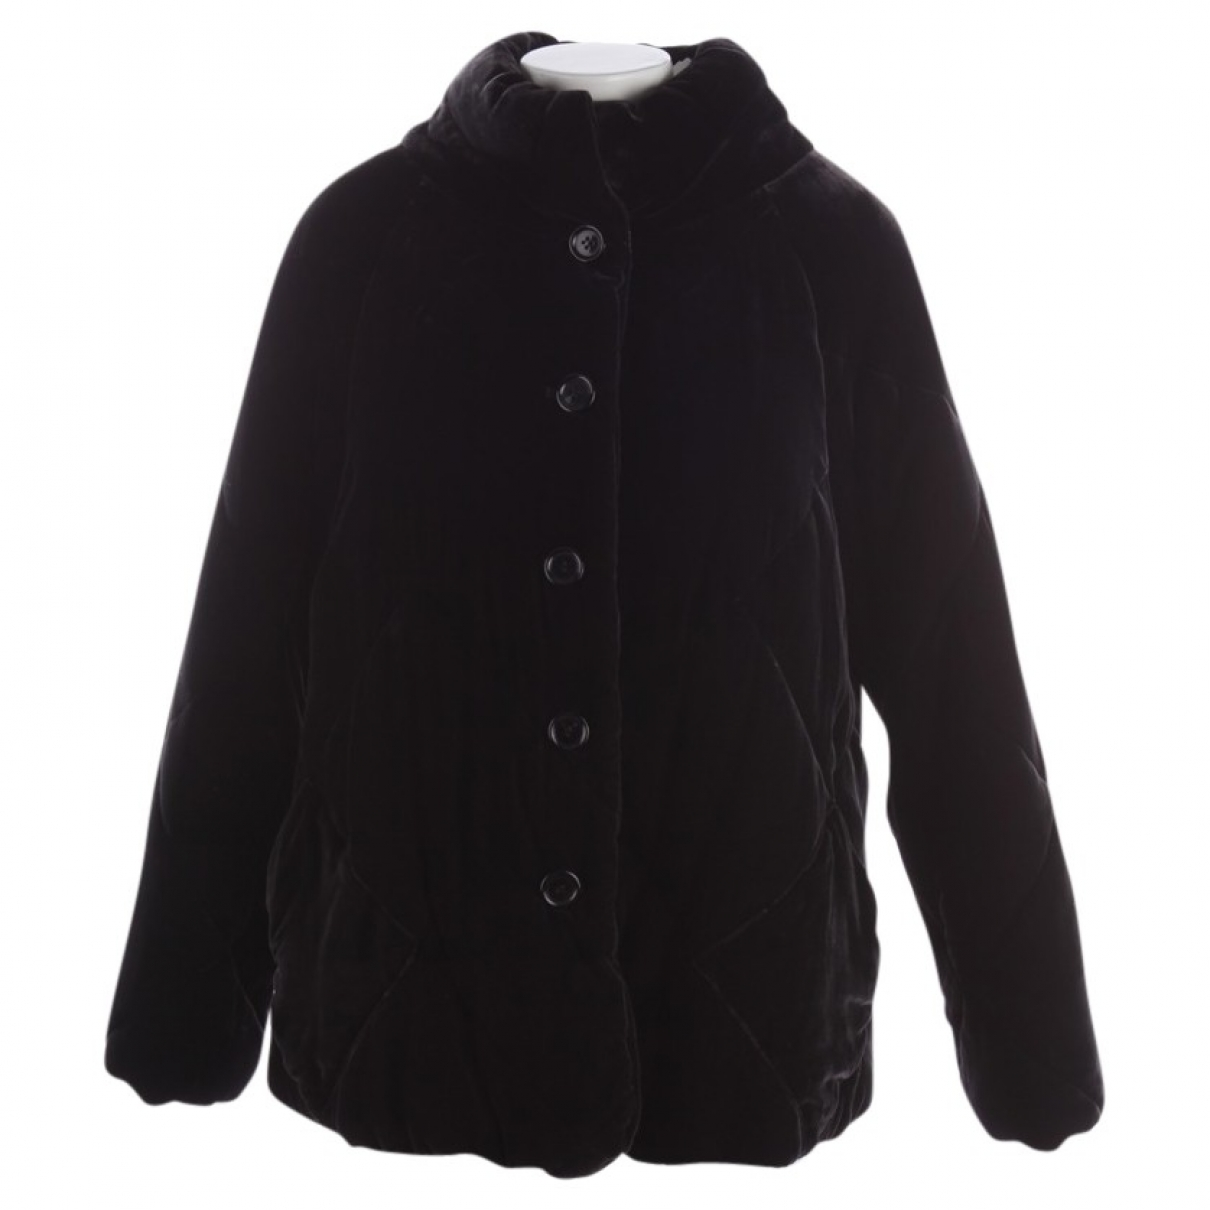 Aspesi \N Black jacket for Women L International